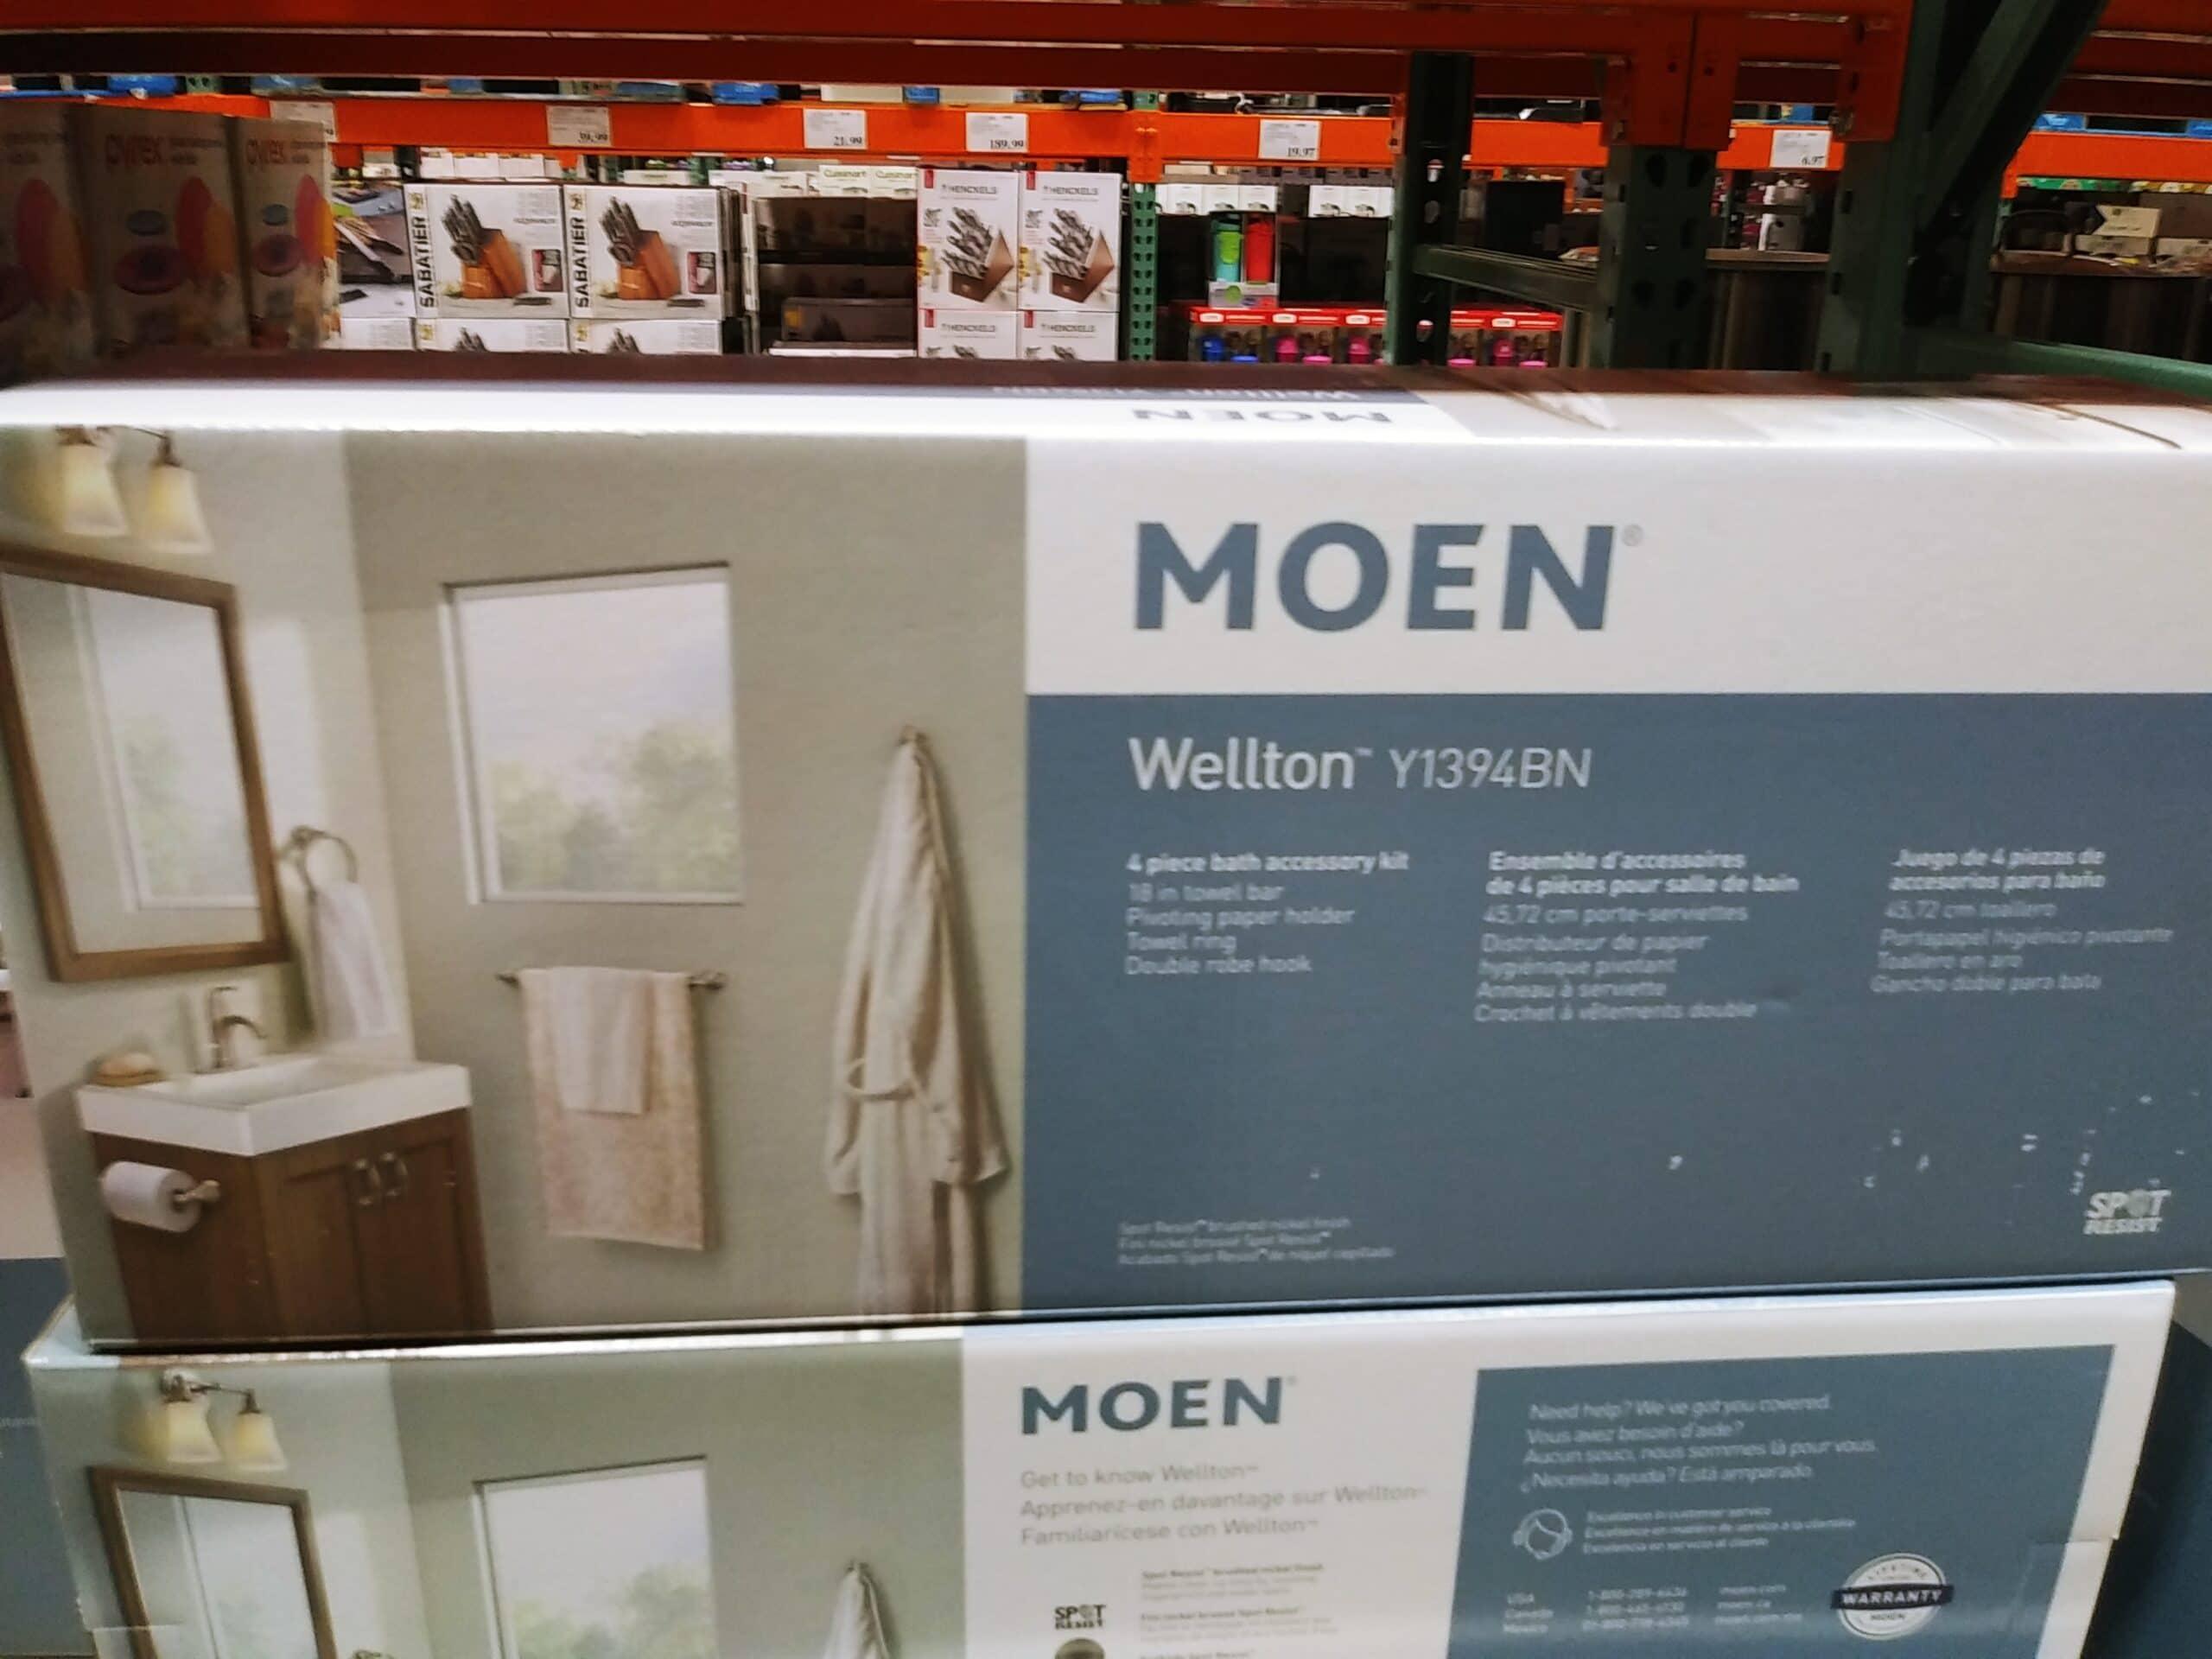 Moen Wellton 4pc Bath Hardware Set $29.97